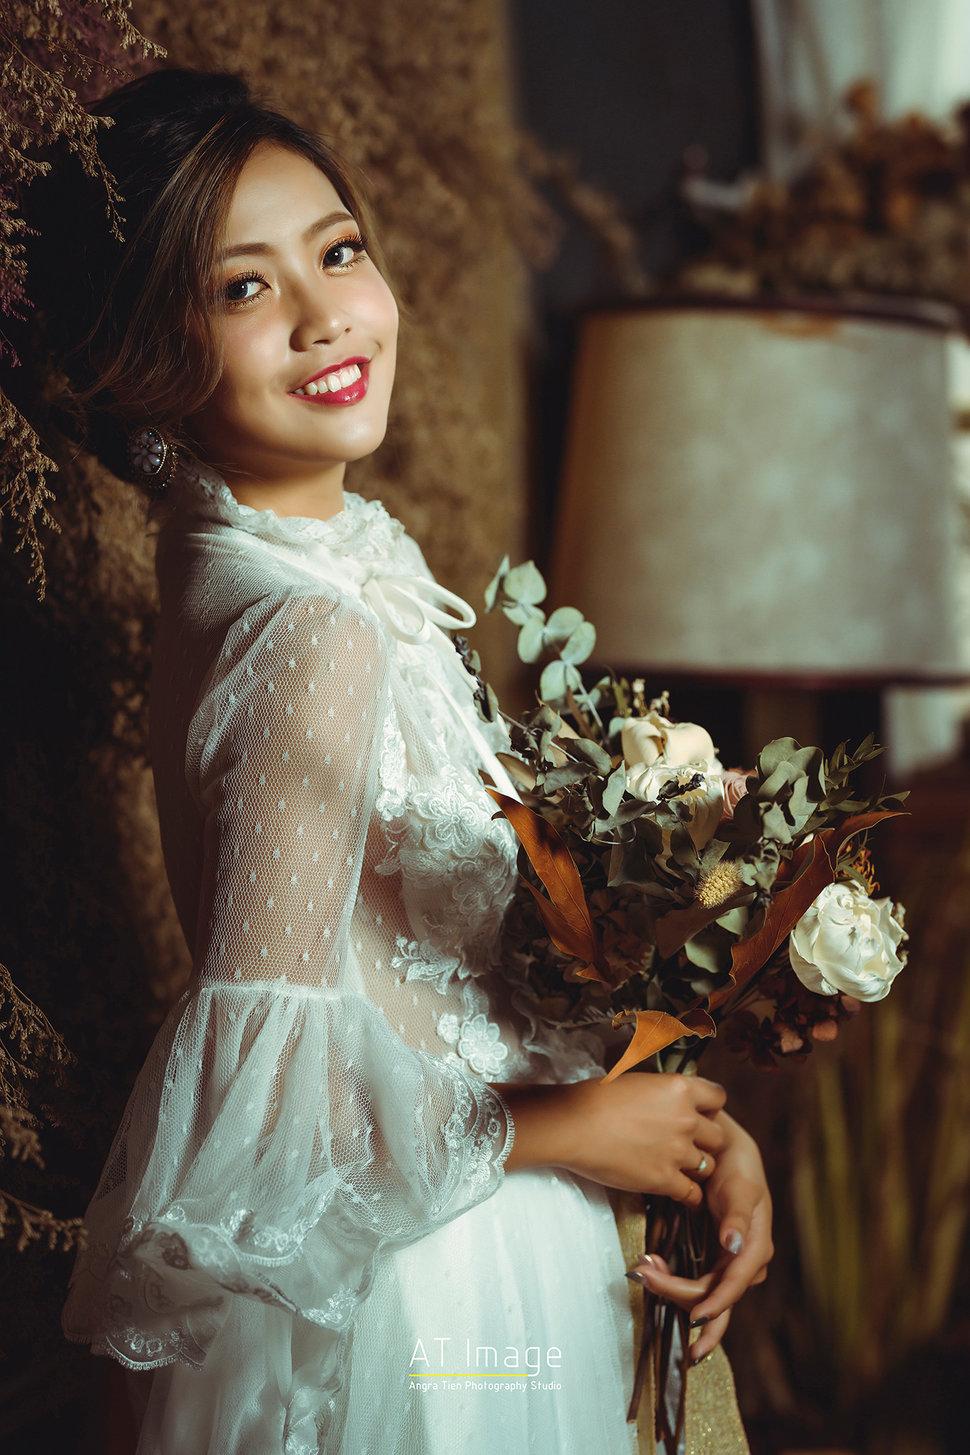 AZ7_1583 - Nico妮可彩妝造型-噴槍底妝《結婚吧》